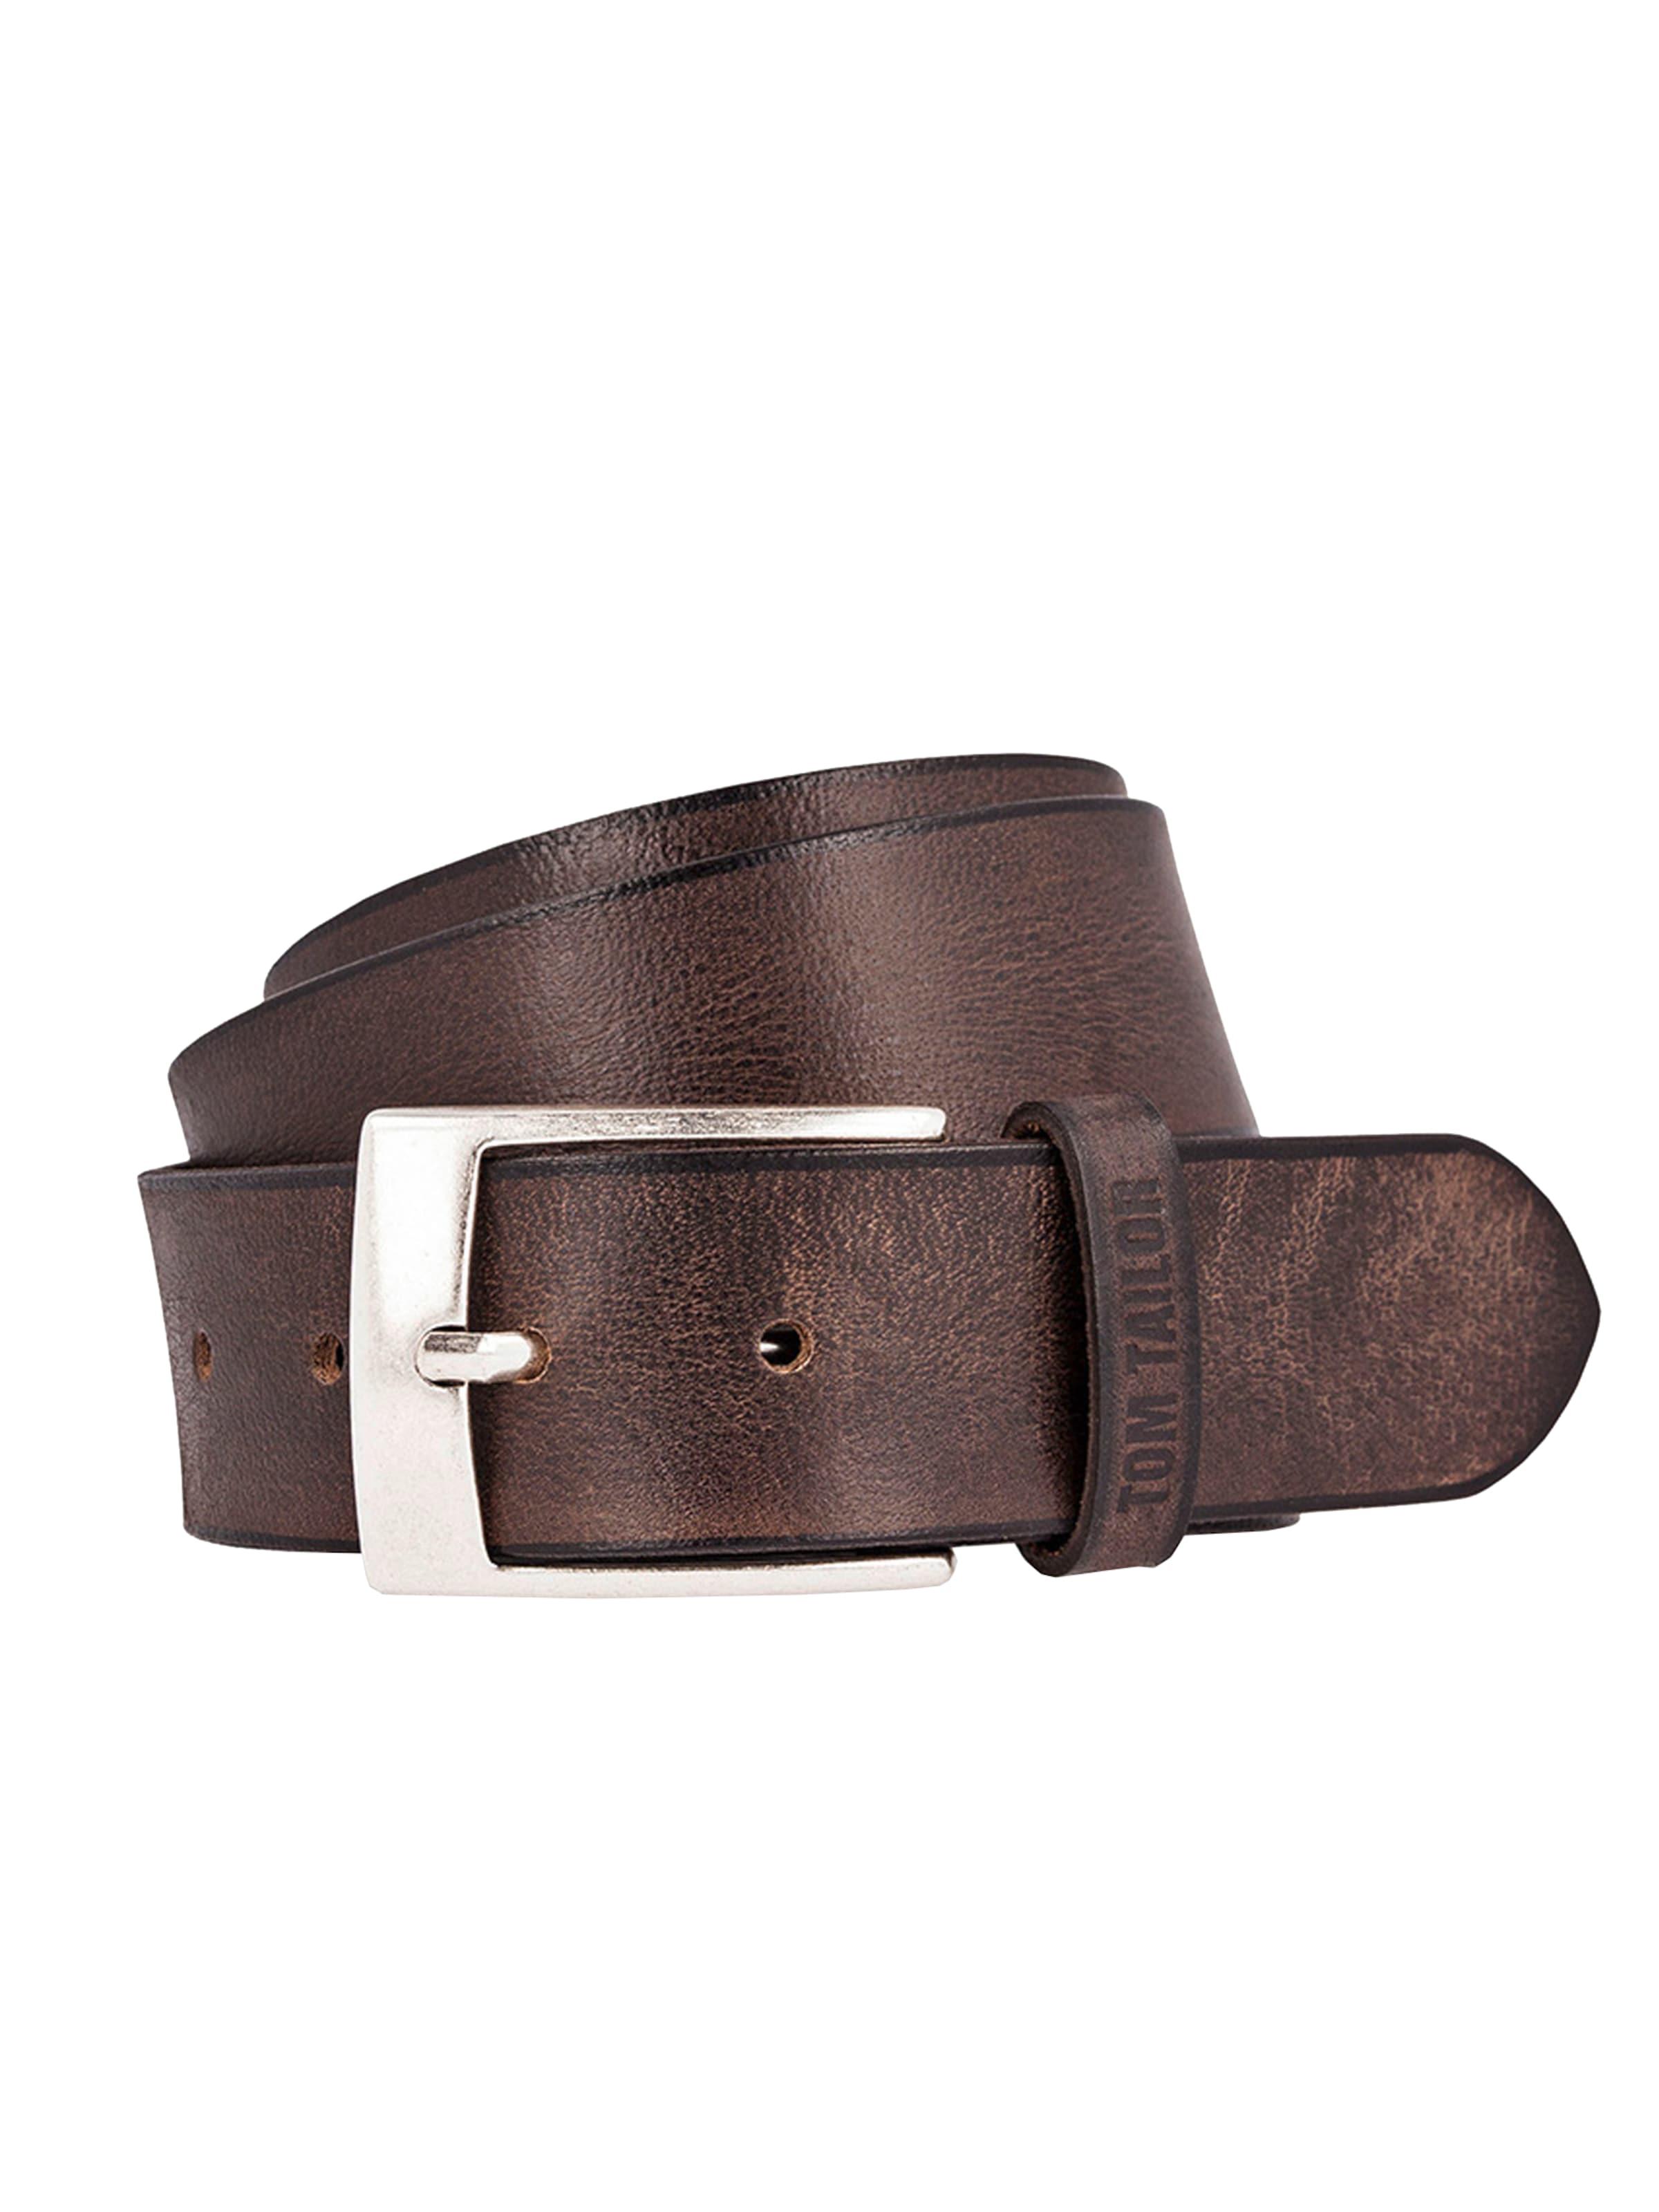 Tailor Fullgrain Ceinture Brun Foncé Tom 'used En Leather Belt' vy8n0NPmwO